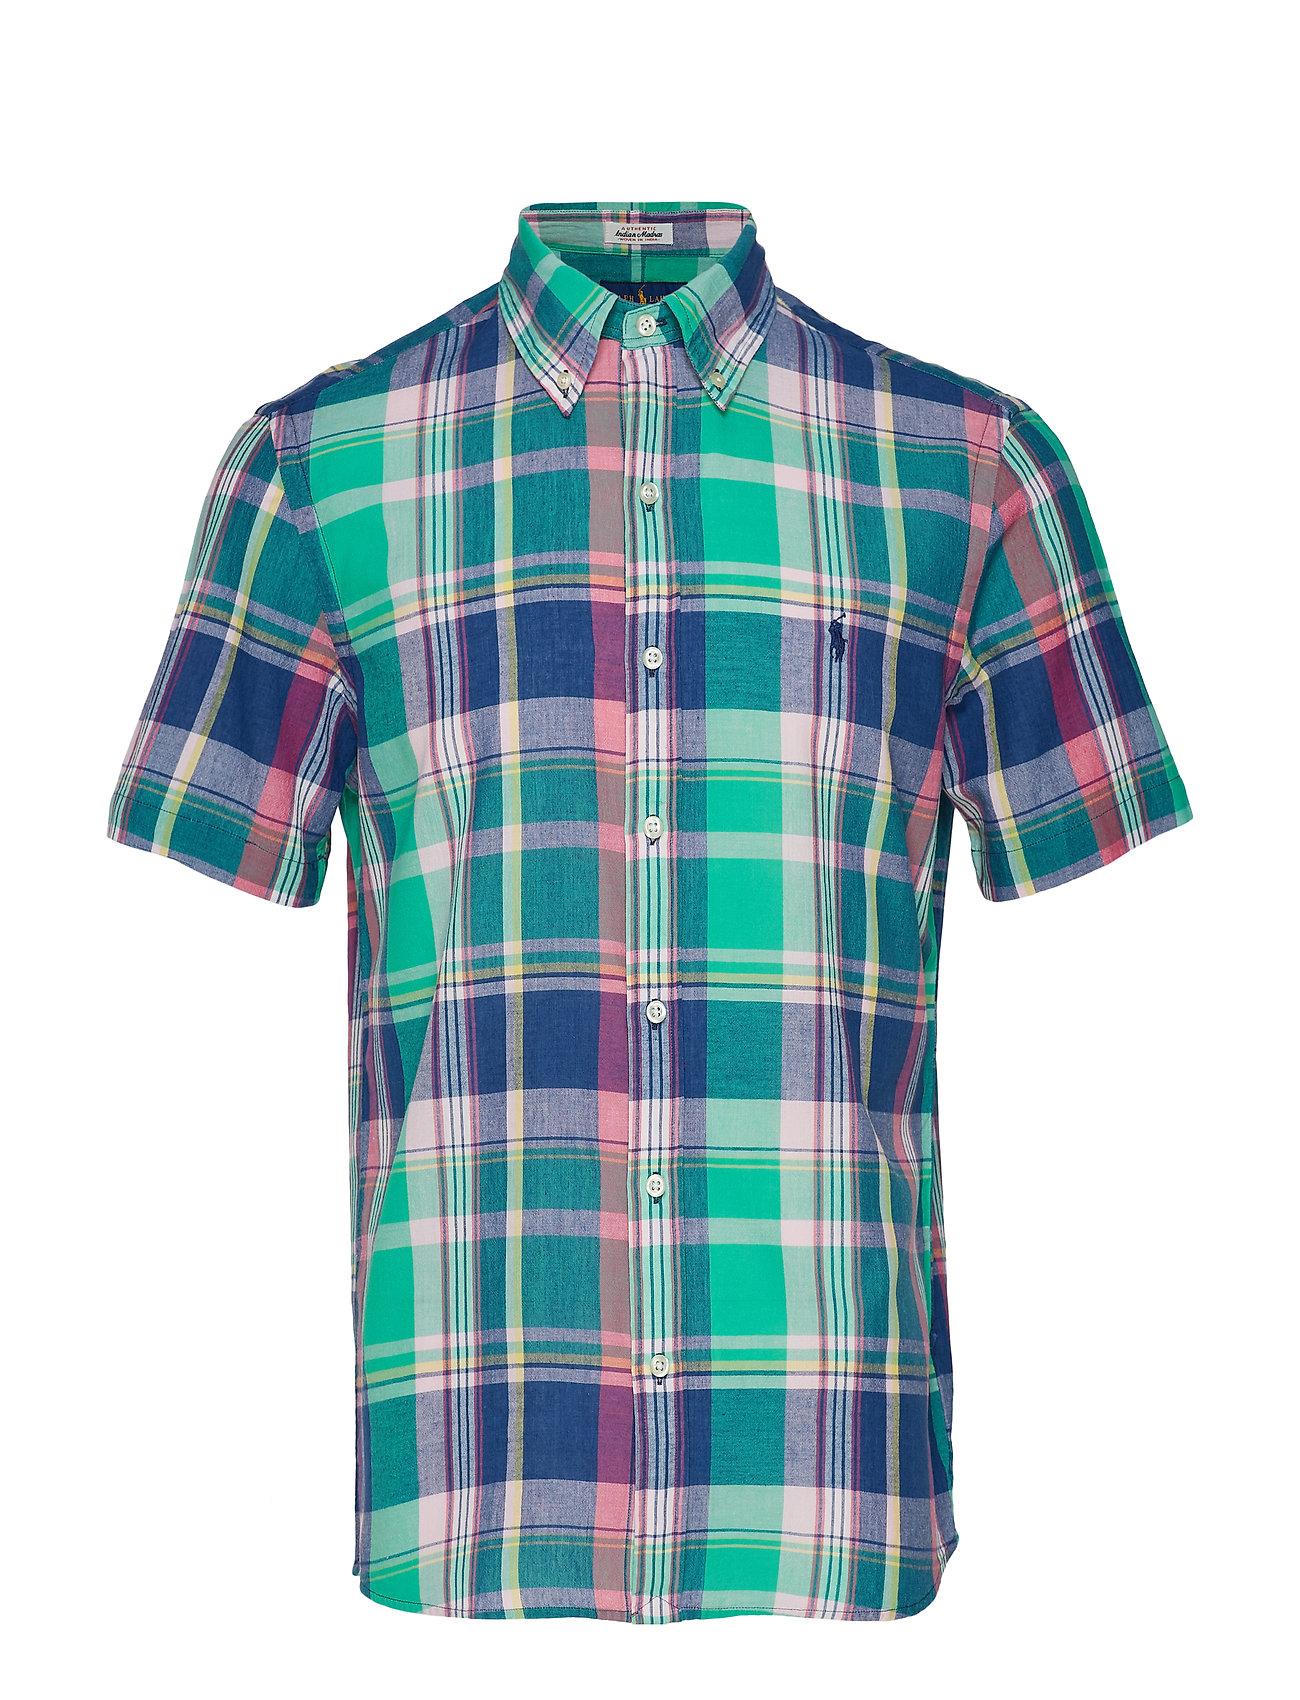 Polo Ralph Lauren Custom Fit Madras Shirt